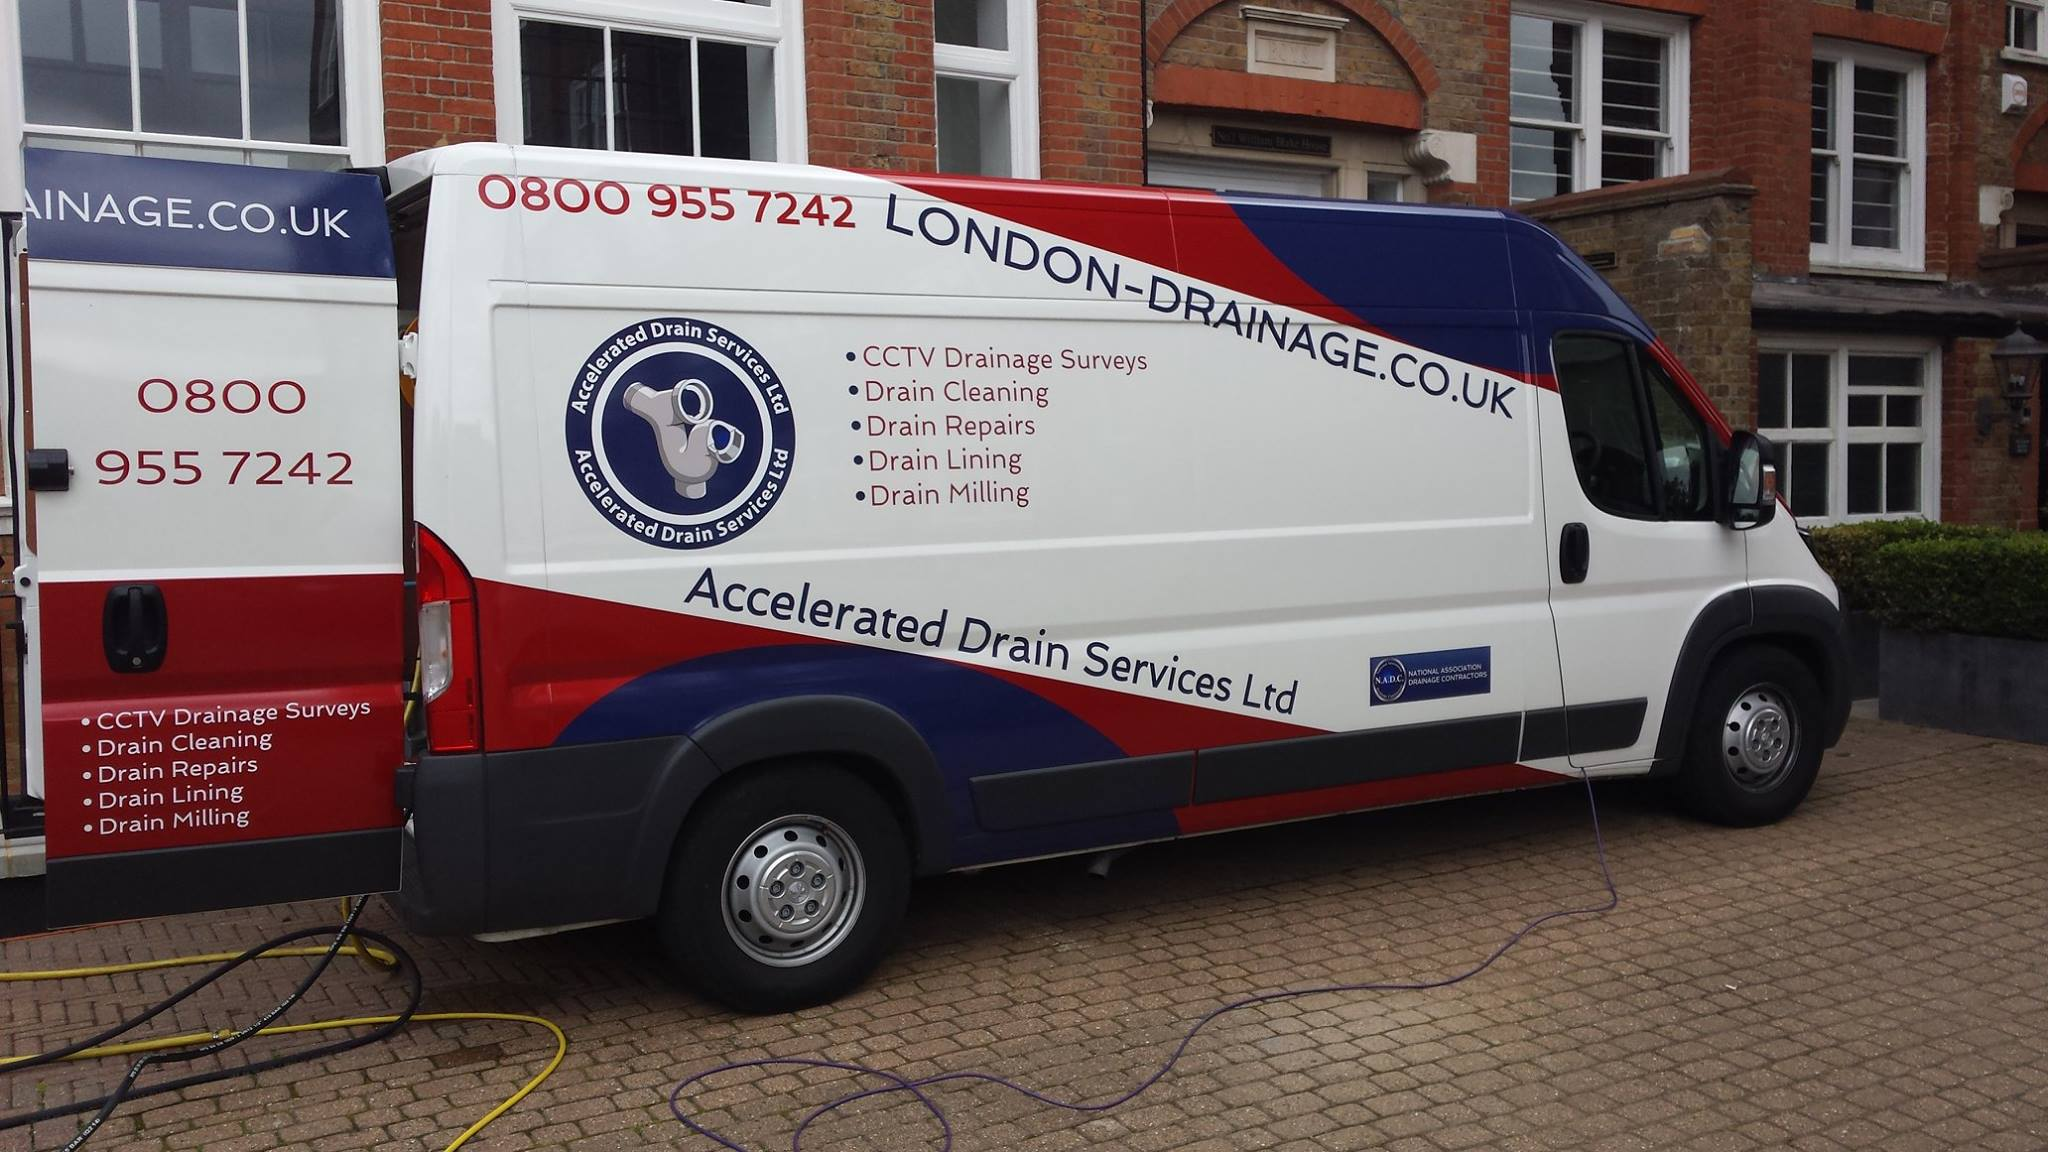 Drainage Van Branding